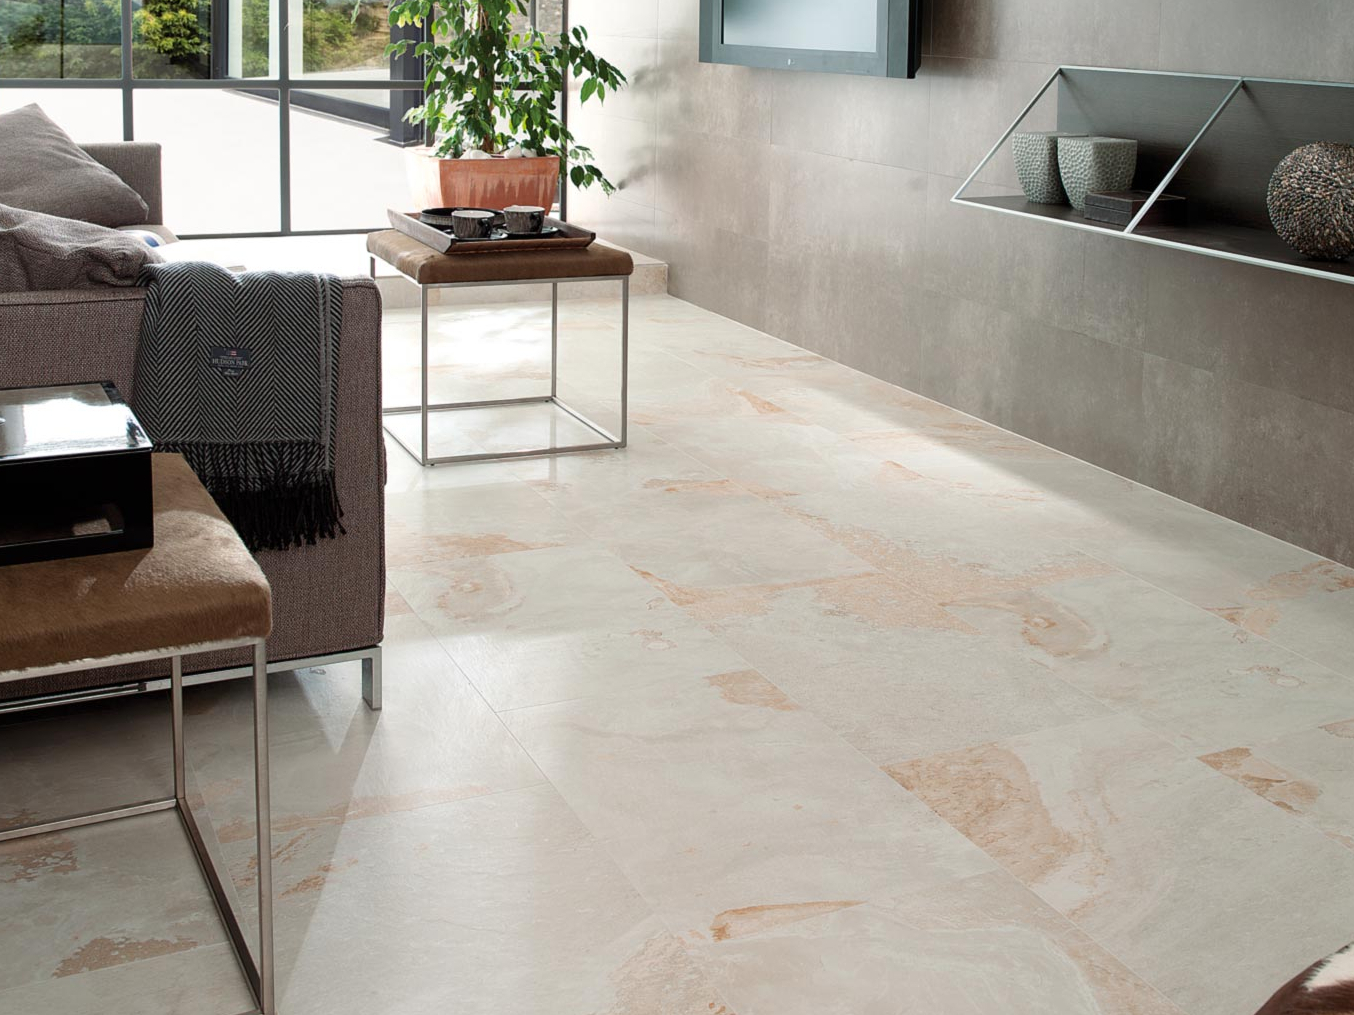 Wall floor tiles ston ker tibet ston ker collection by - Ston ker porcelanosa ...